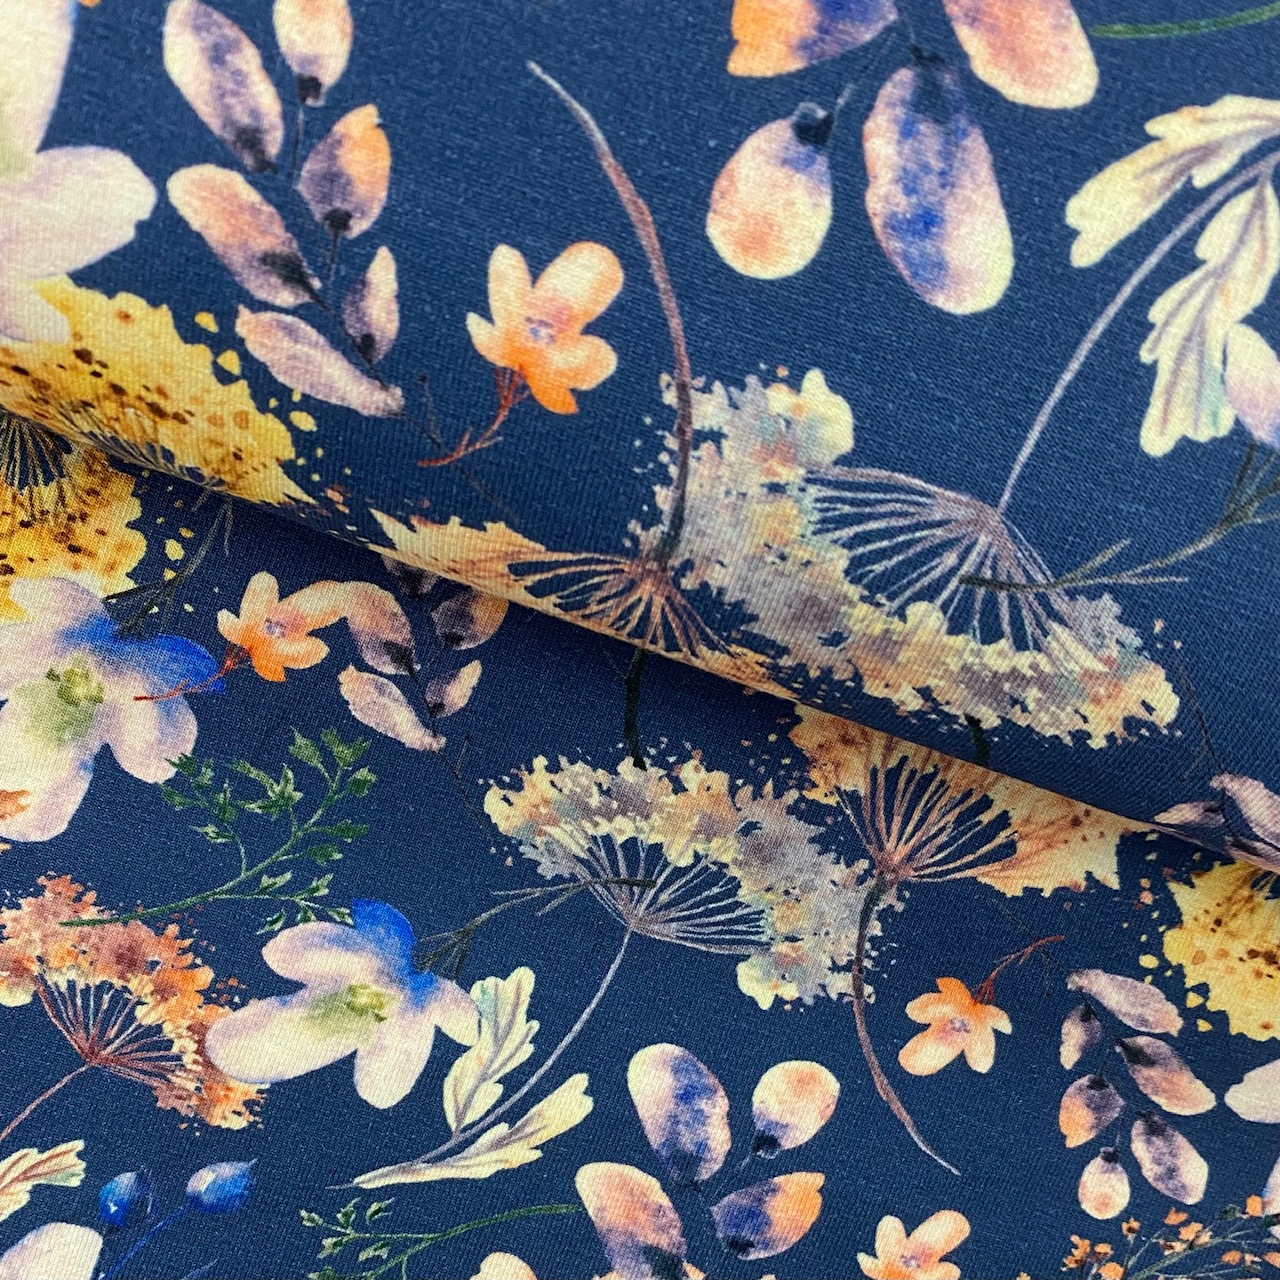 Baumwolljersey, Aquarellblumen, Digital Druck, jeansblau. Art. 4974-1107